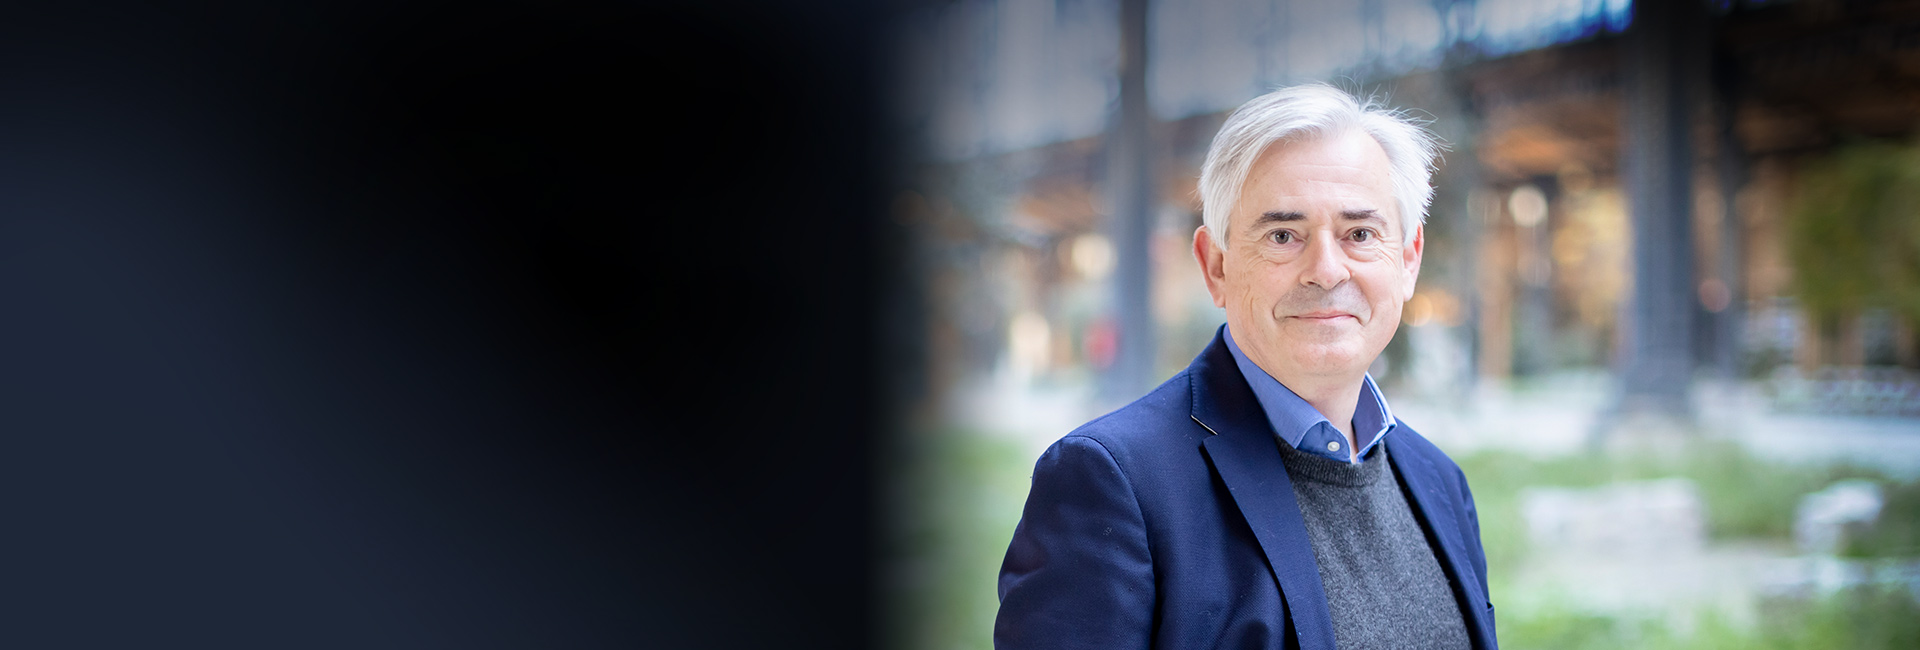 Dirk  Lybaert: Chief Corporate Affairs Officer